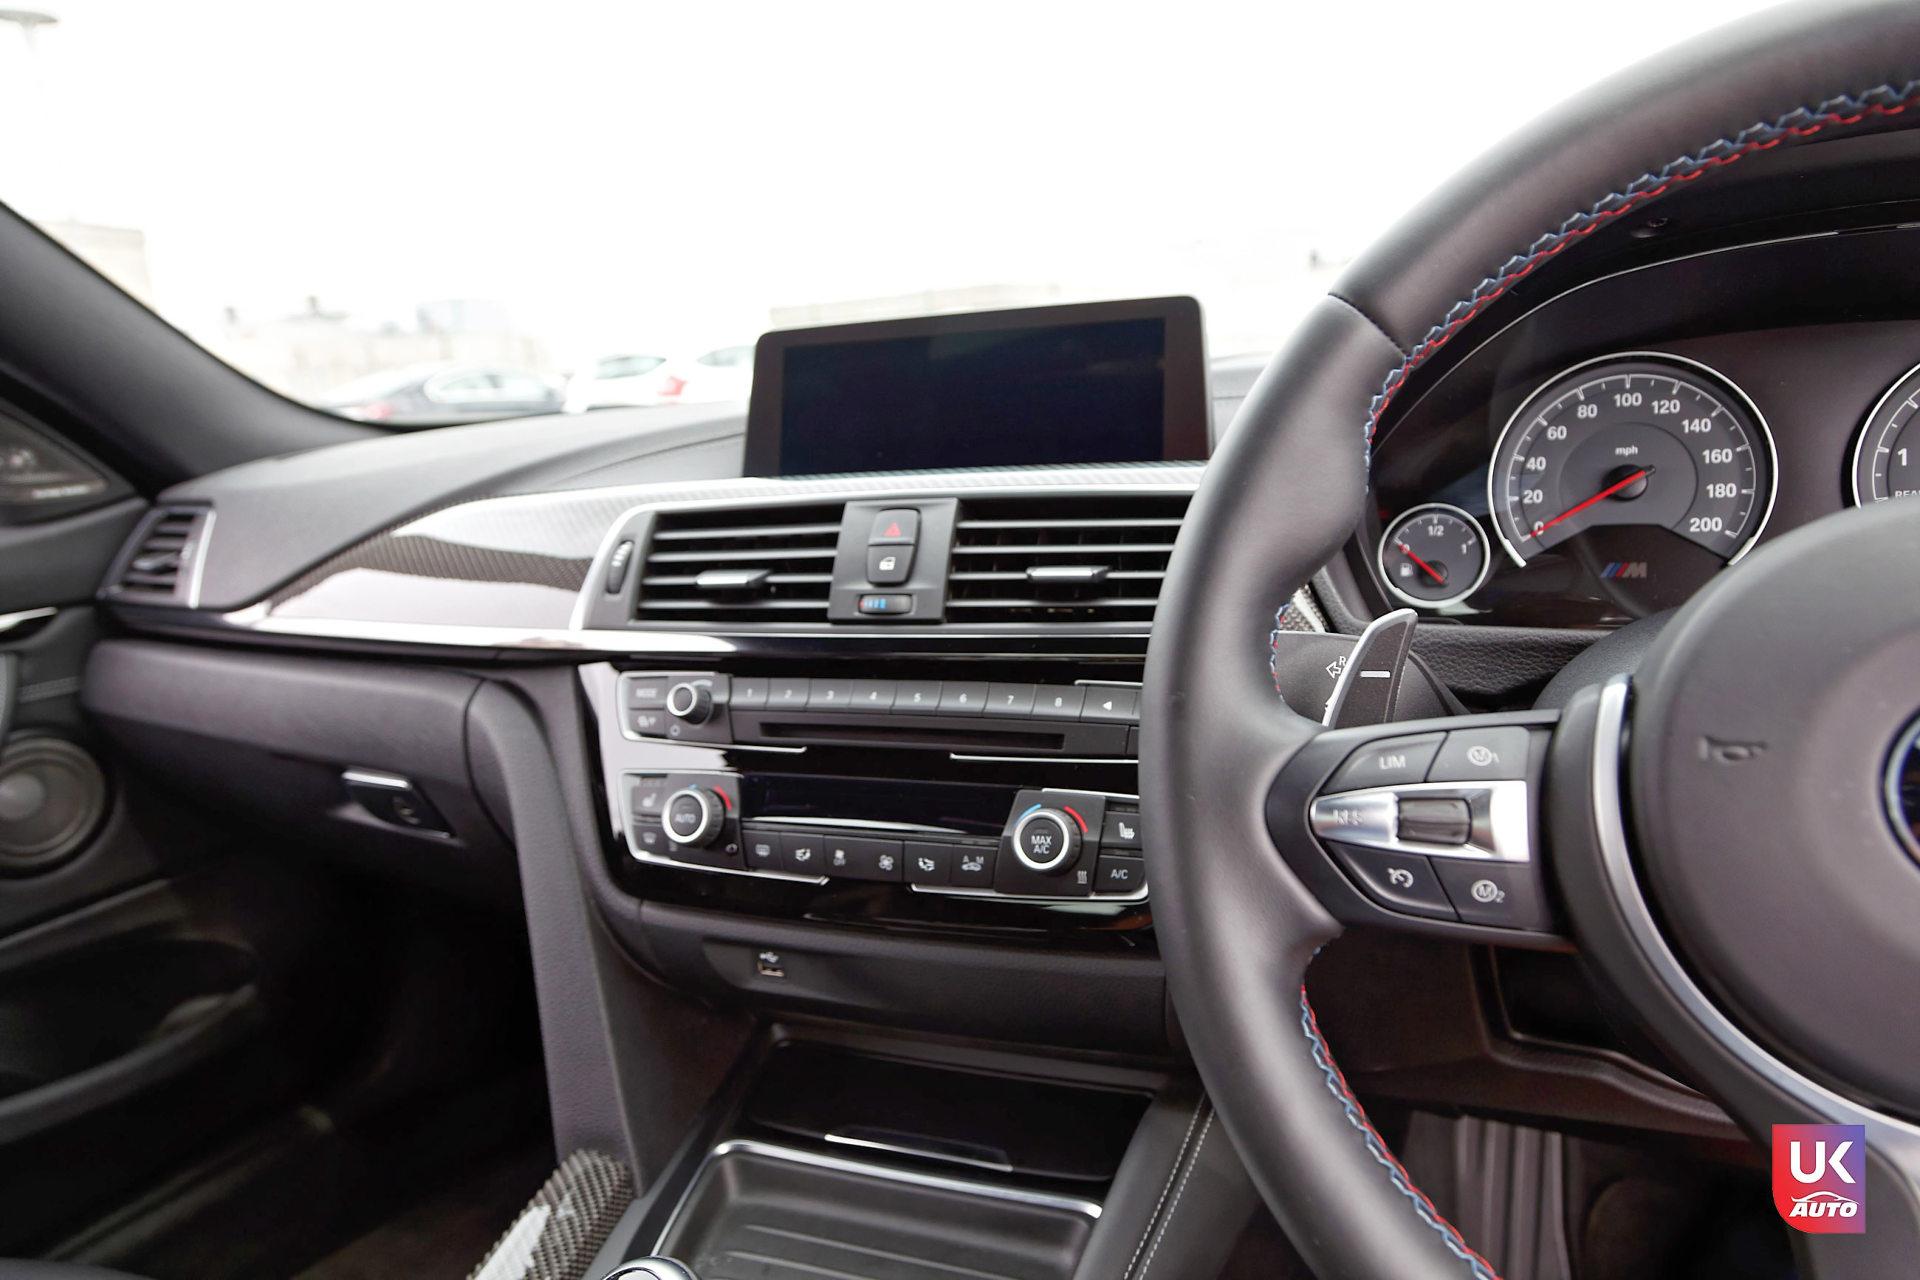 BMW M4 PACK COMPETITION BMW ANGLETERRE BMW IMPORT UK BMW MANDATAIRE AUTO10 DxO - IMPORTATION BMW M4 BMW IMPORT ROYAUME UNI BMW M4 COMPETITION RHD CLIENT UKAUTO